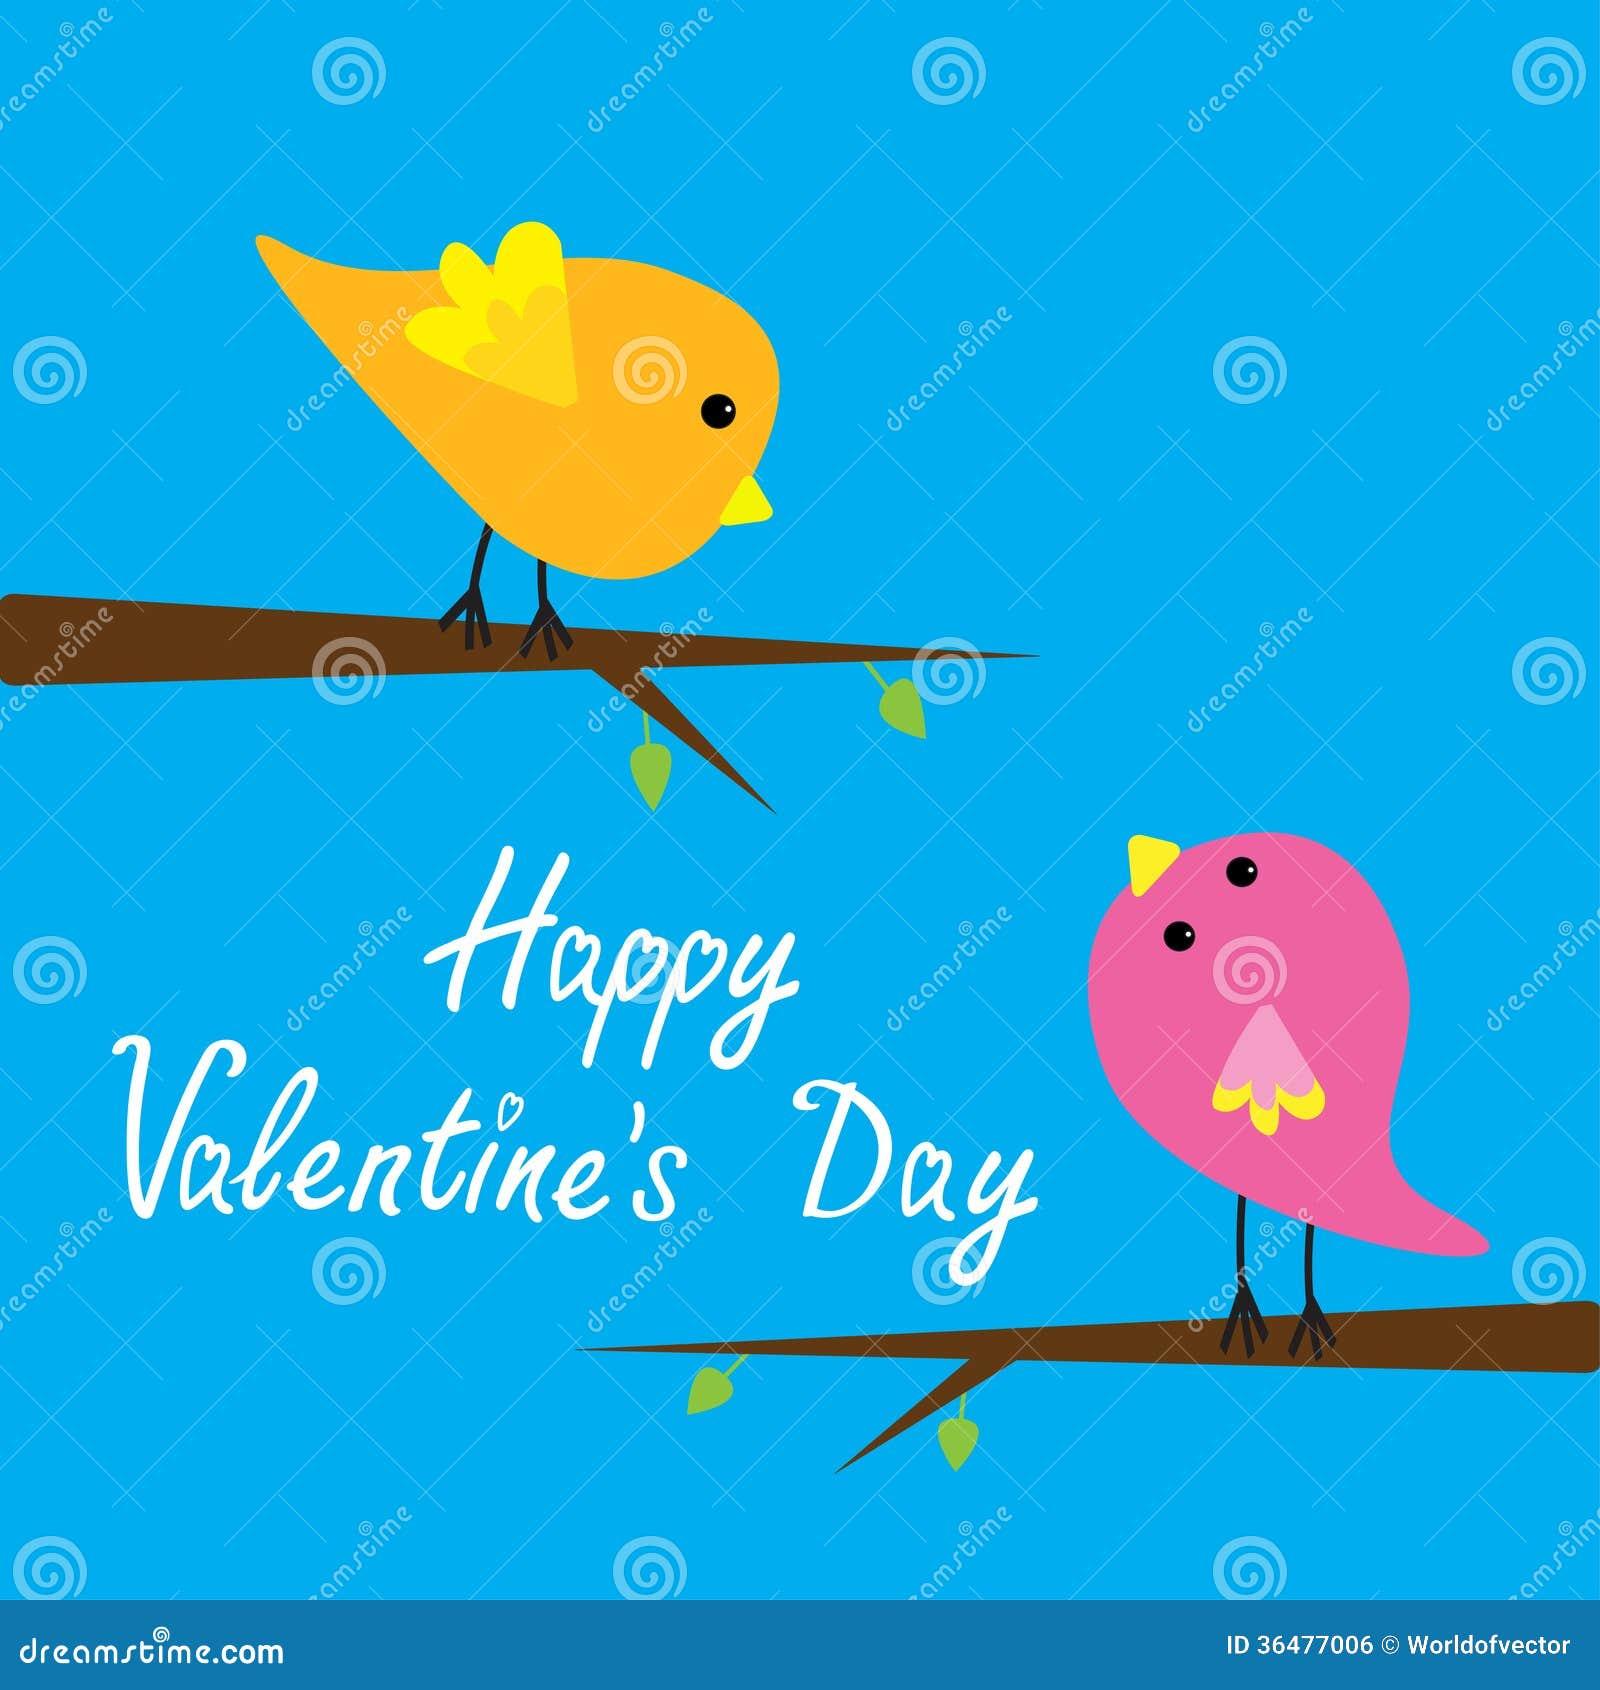 Two Cartoon Birds Happy Valentines Day Card Stock Vector